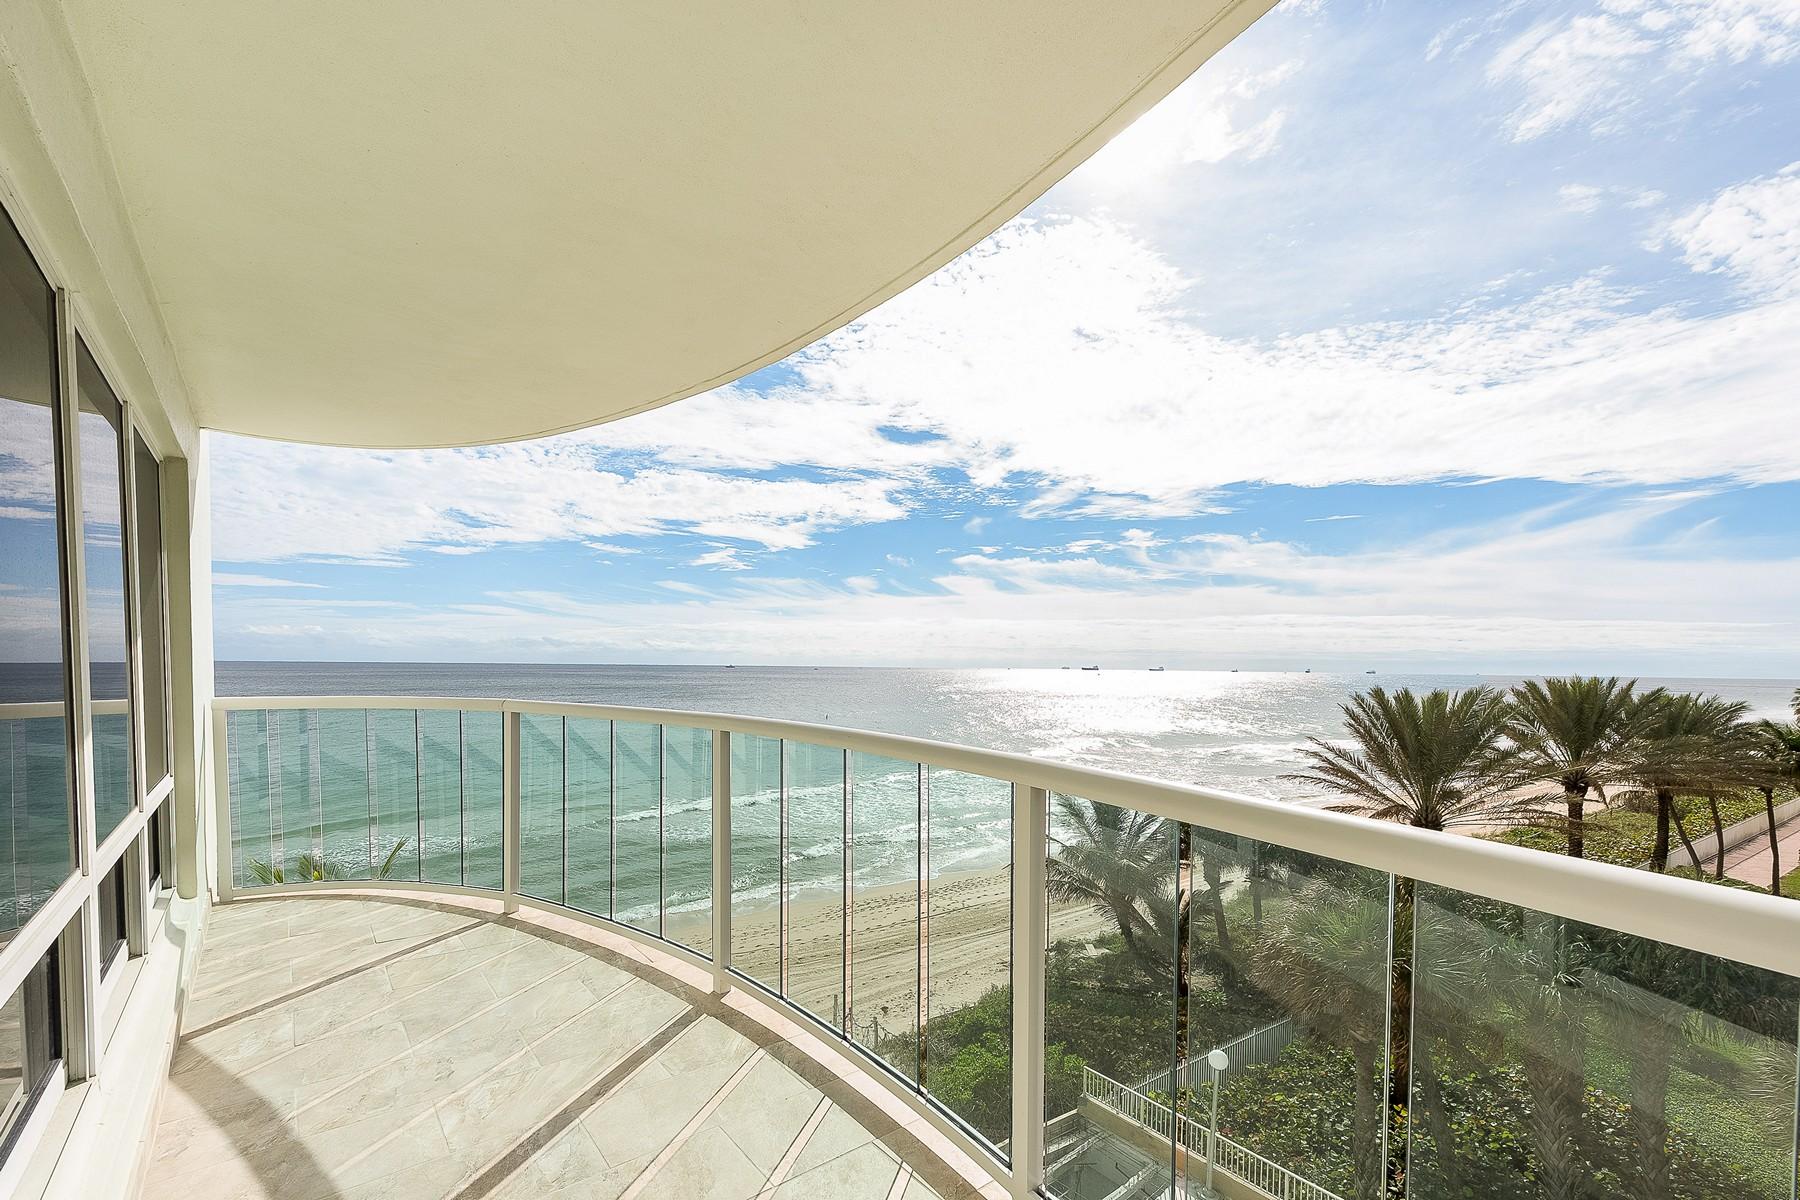 Condomínio para Venda às 3400 Galt Ocean Dr #302S Fort Lauderdale, Florida 33308 Estados Unidos